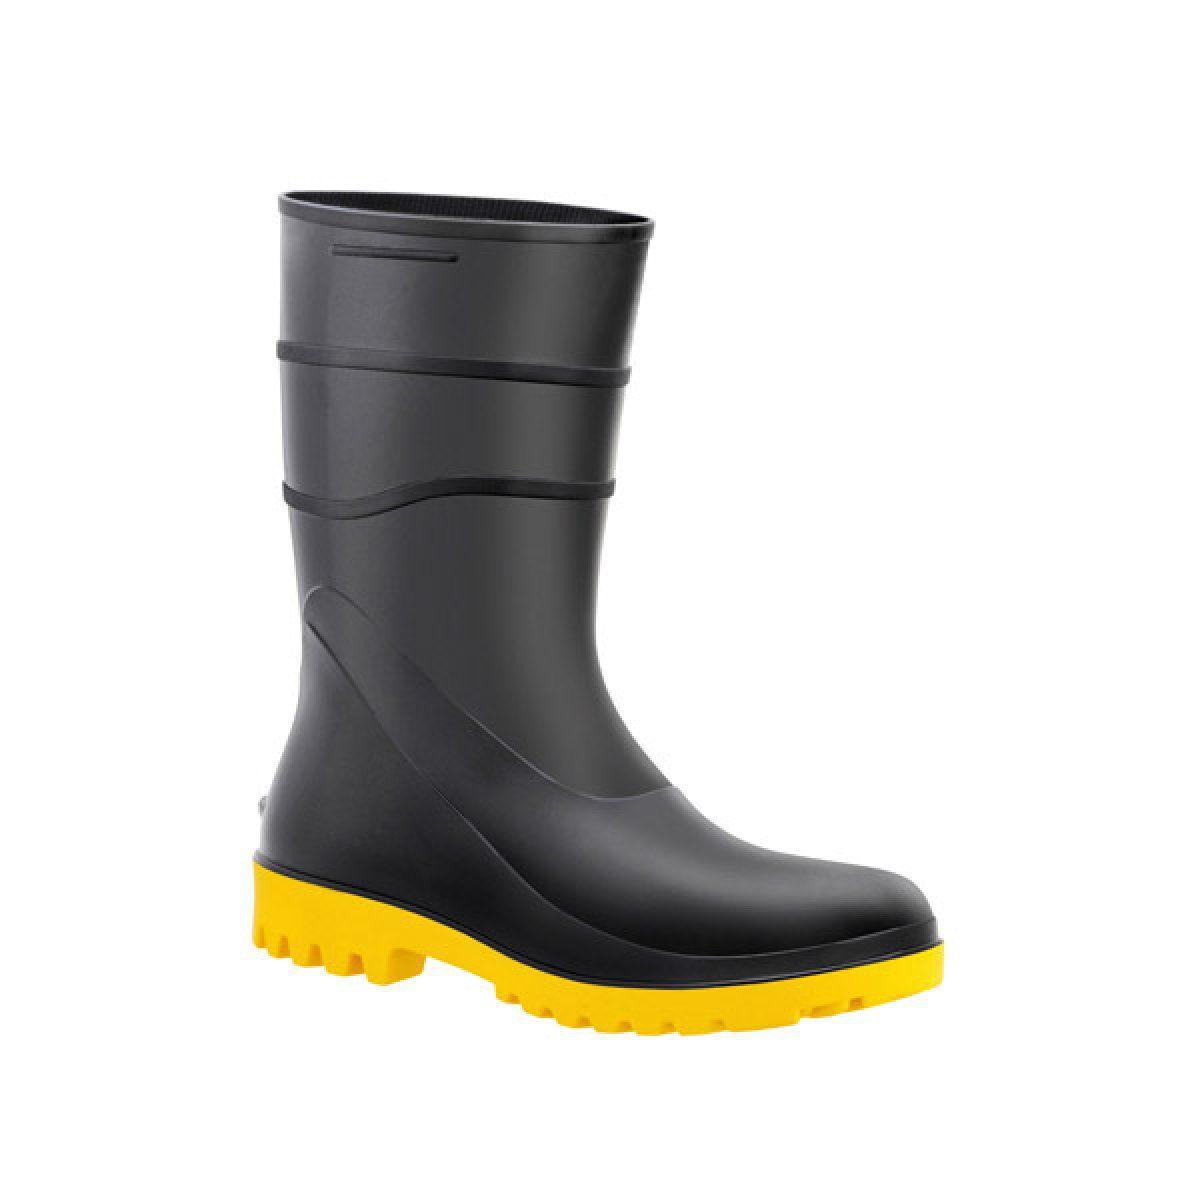 Bota de PVC Preta c/ Solado Amarelo N°39 - BRACOL